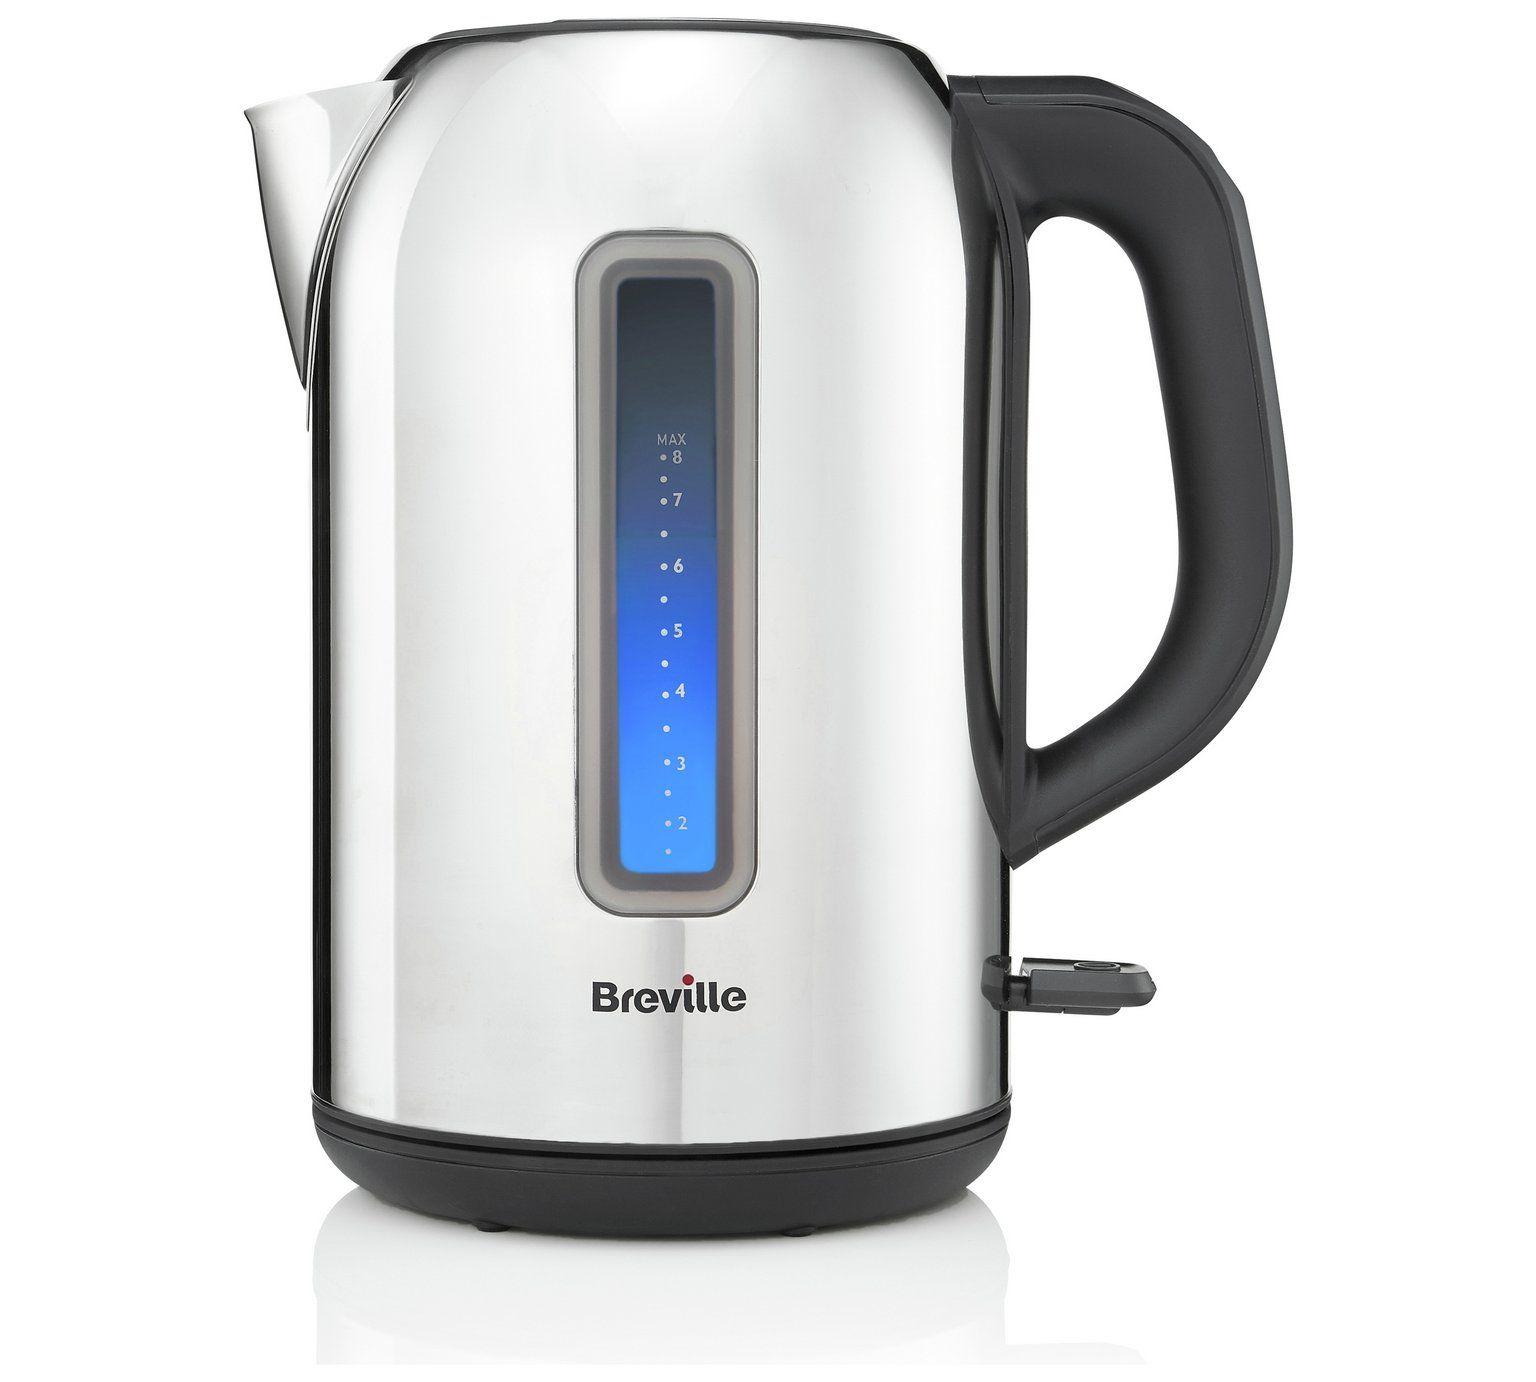 Breville S/Steel 1.7ltr rapid boil kettle. 1/2 price, now £19.99 @ Argos